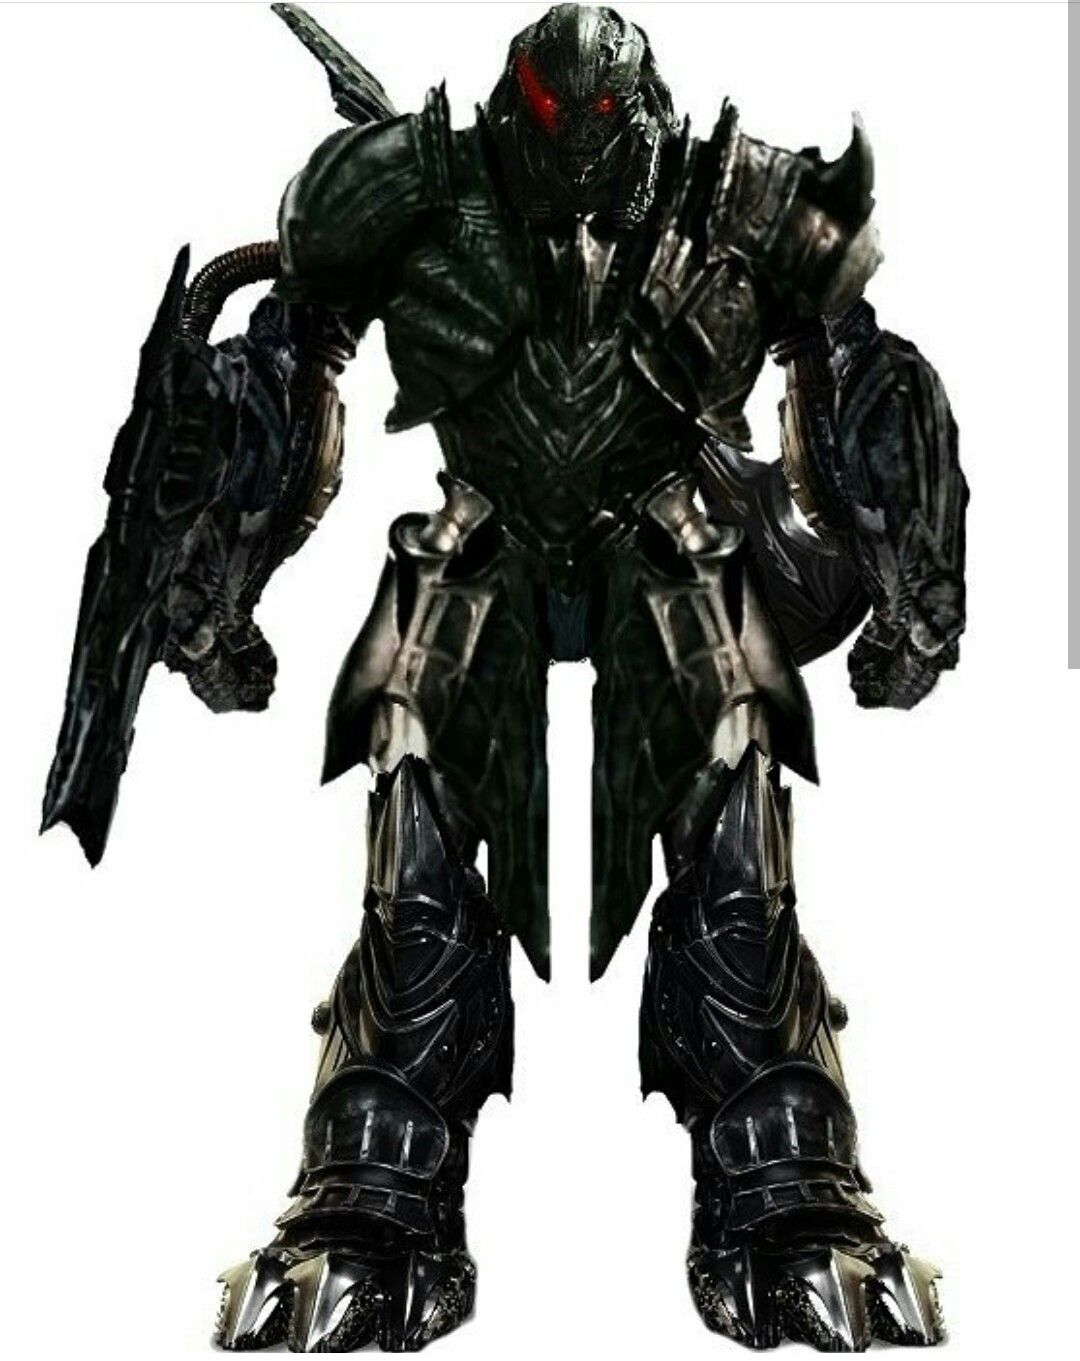 Megatron 2017 Transformers Movie Megatron Transformers